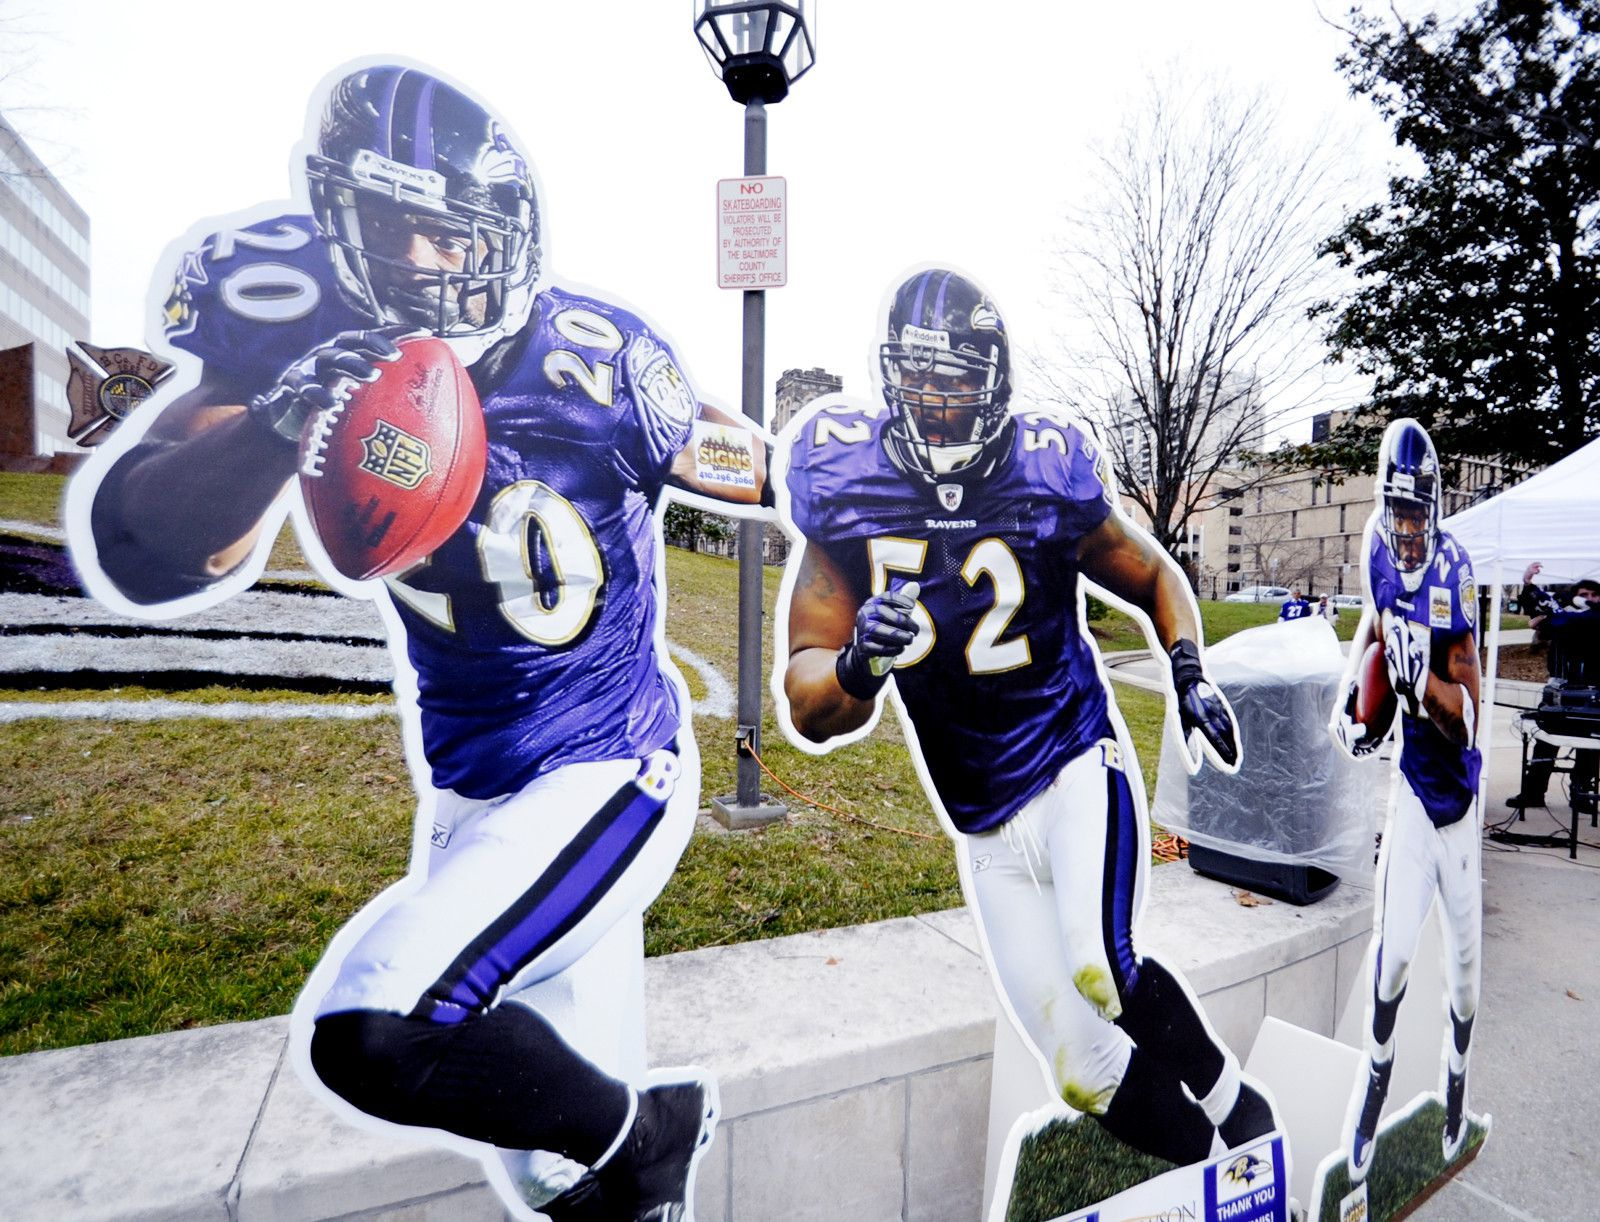 Https Www Baltimoresun Com Sports Ravens Bal Ravens Broncos Nickel Package 20130111 Photogallery Html 2013 01 12t12 00 00z Https Www Baltimoresun Com Resizer Vwskgc1jqo8 7amej Mzpqxmjqm Arc Anglerfish Arc2 Prod Tronc S3 Amazonaws